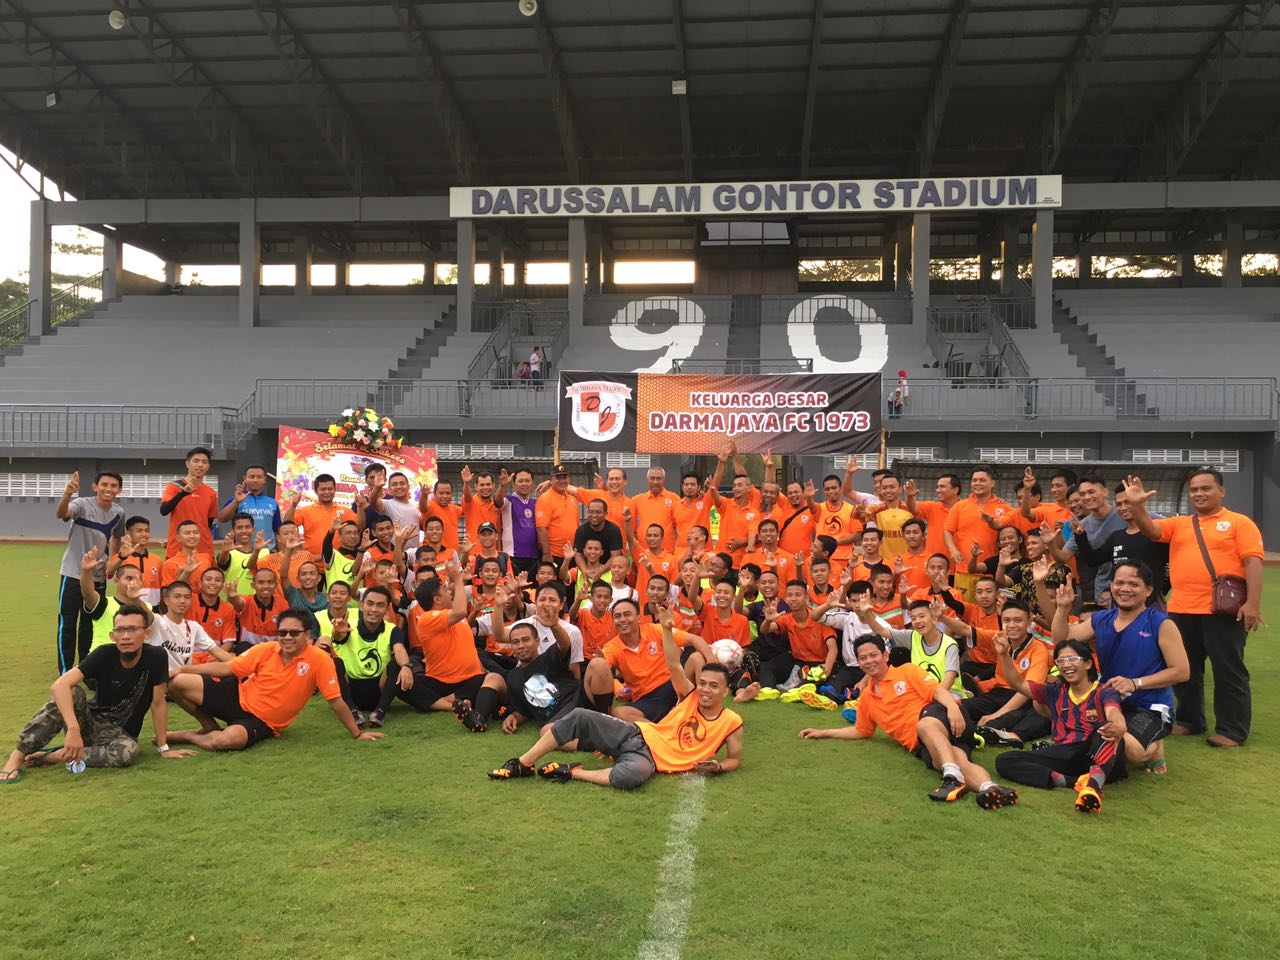 Darmajaya Football Club Gelar Reuni Akbar